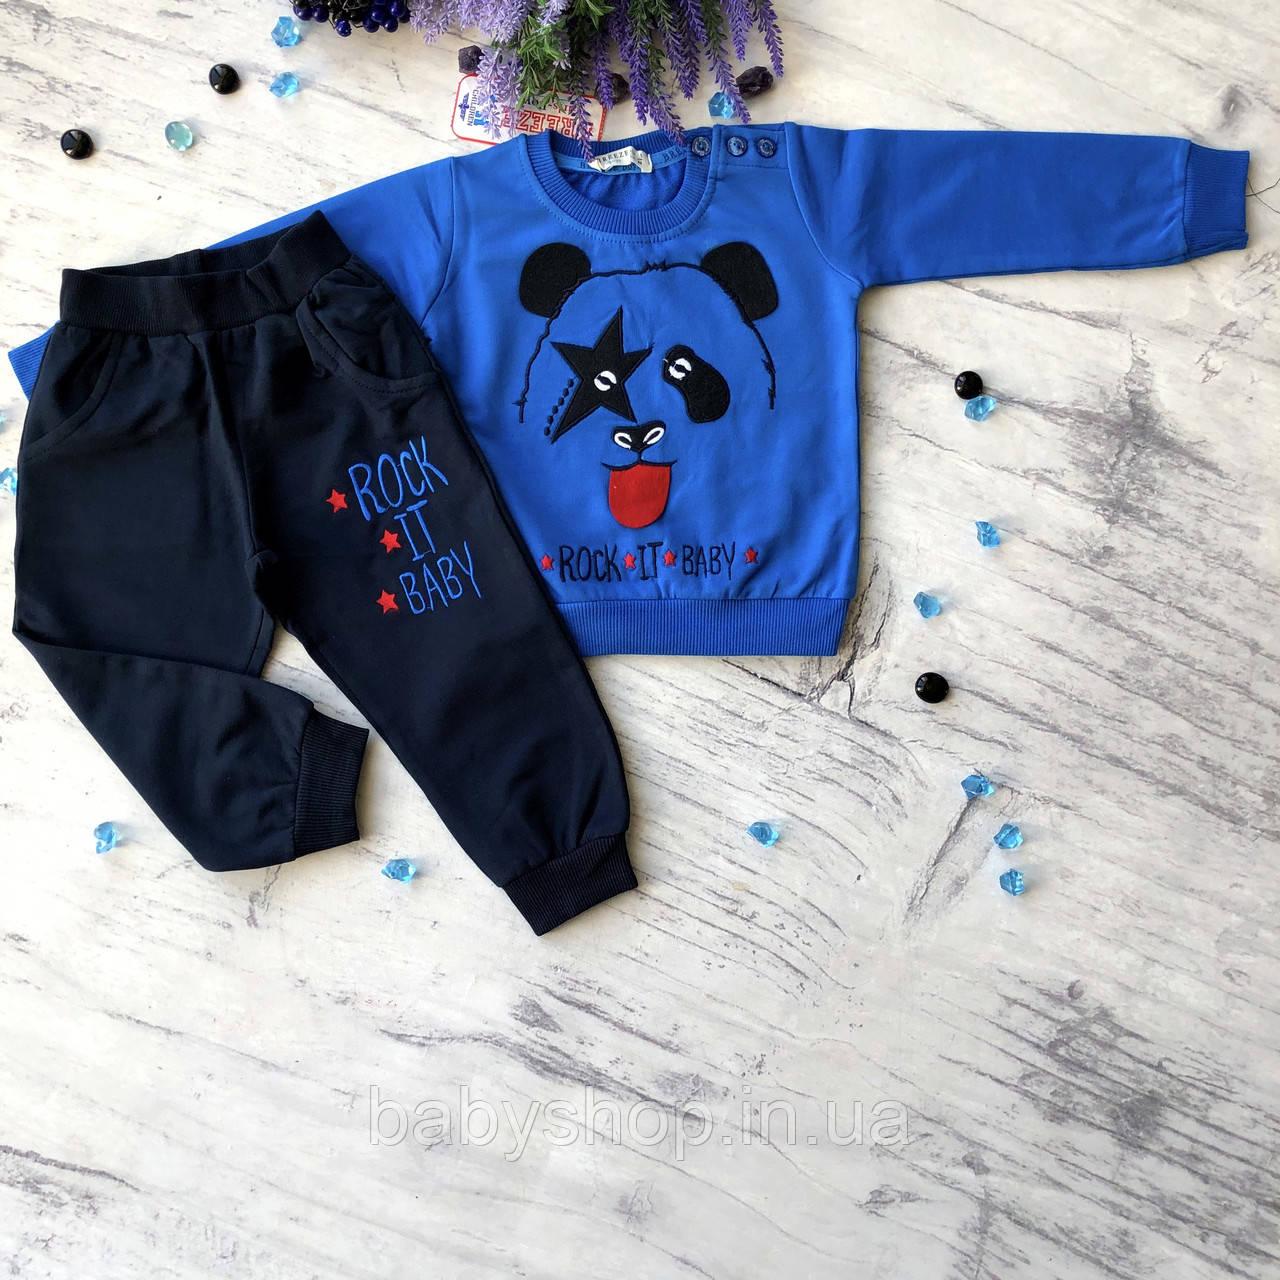 Синий костюм на мальчика Breeze 253. Размер 98 см (3 года)